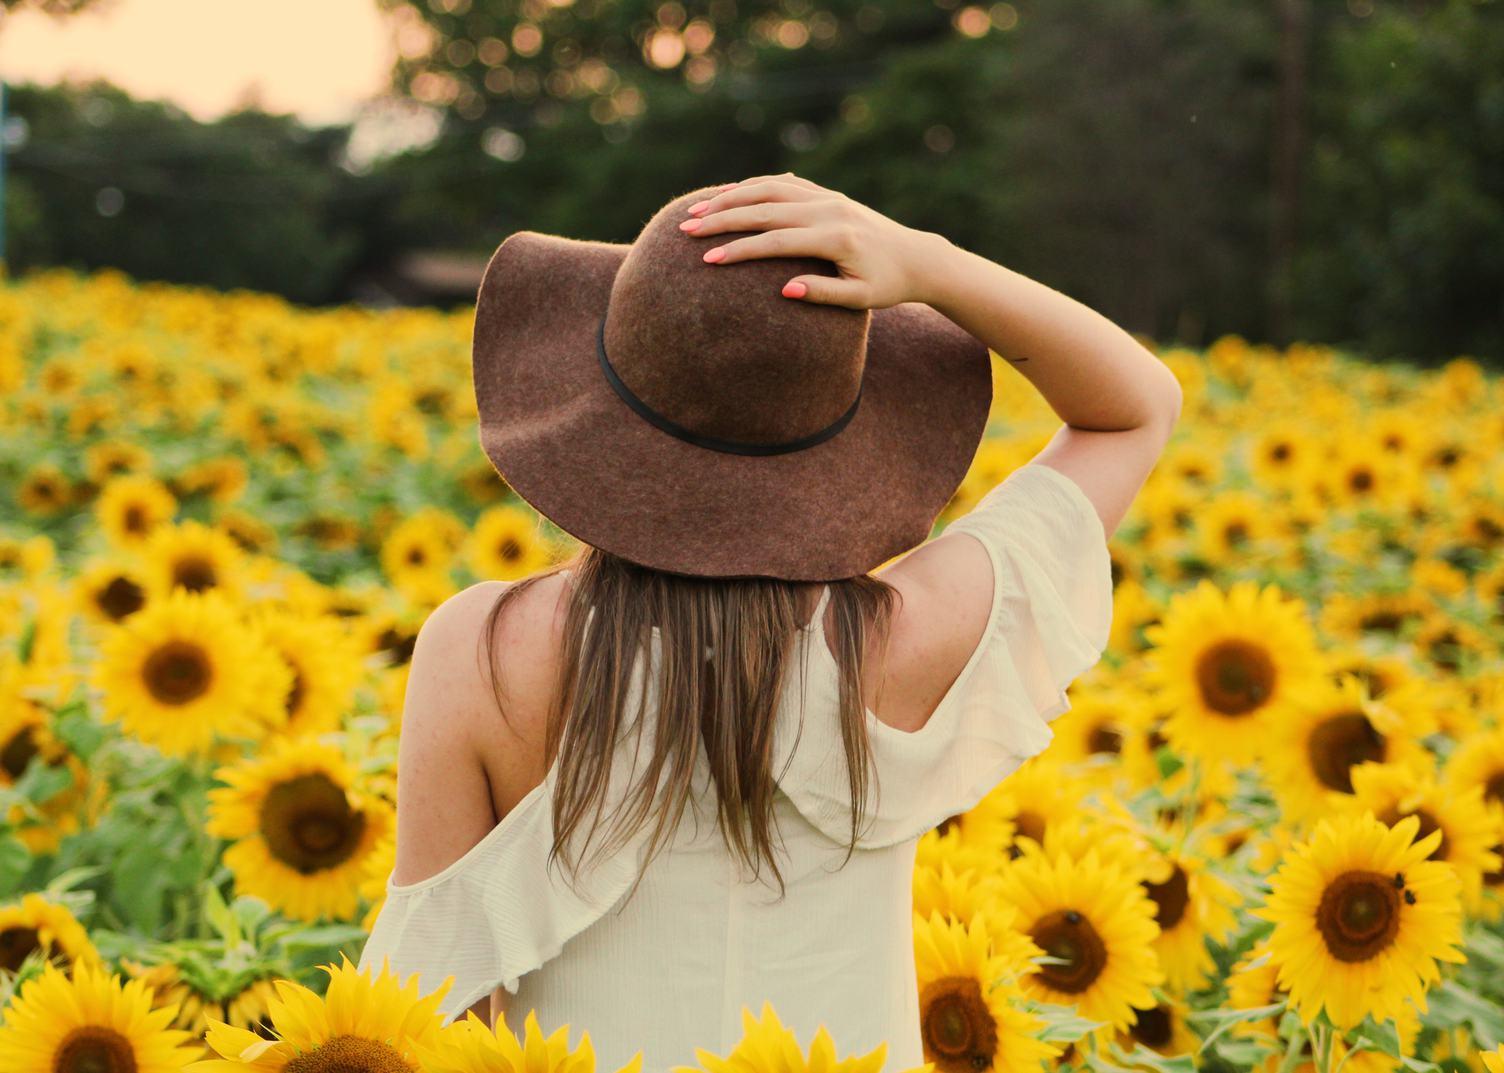 Woman Standing Back in Sunflowers Field